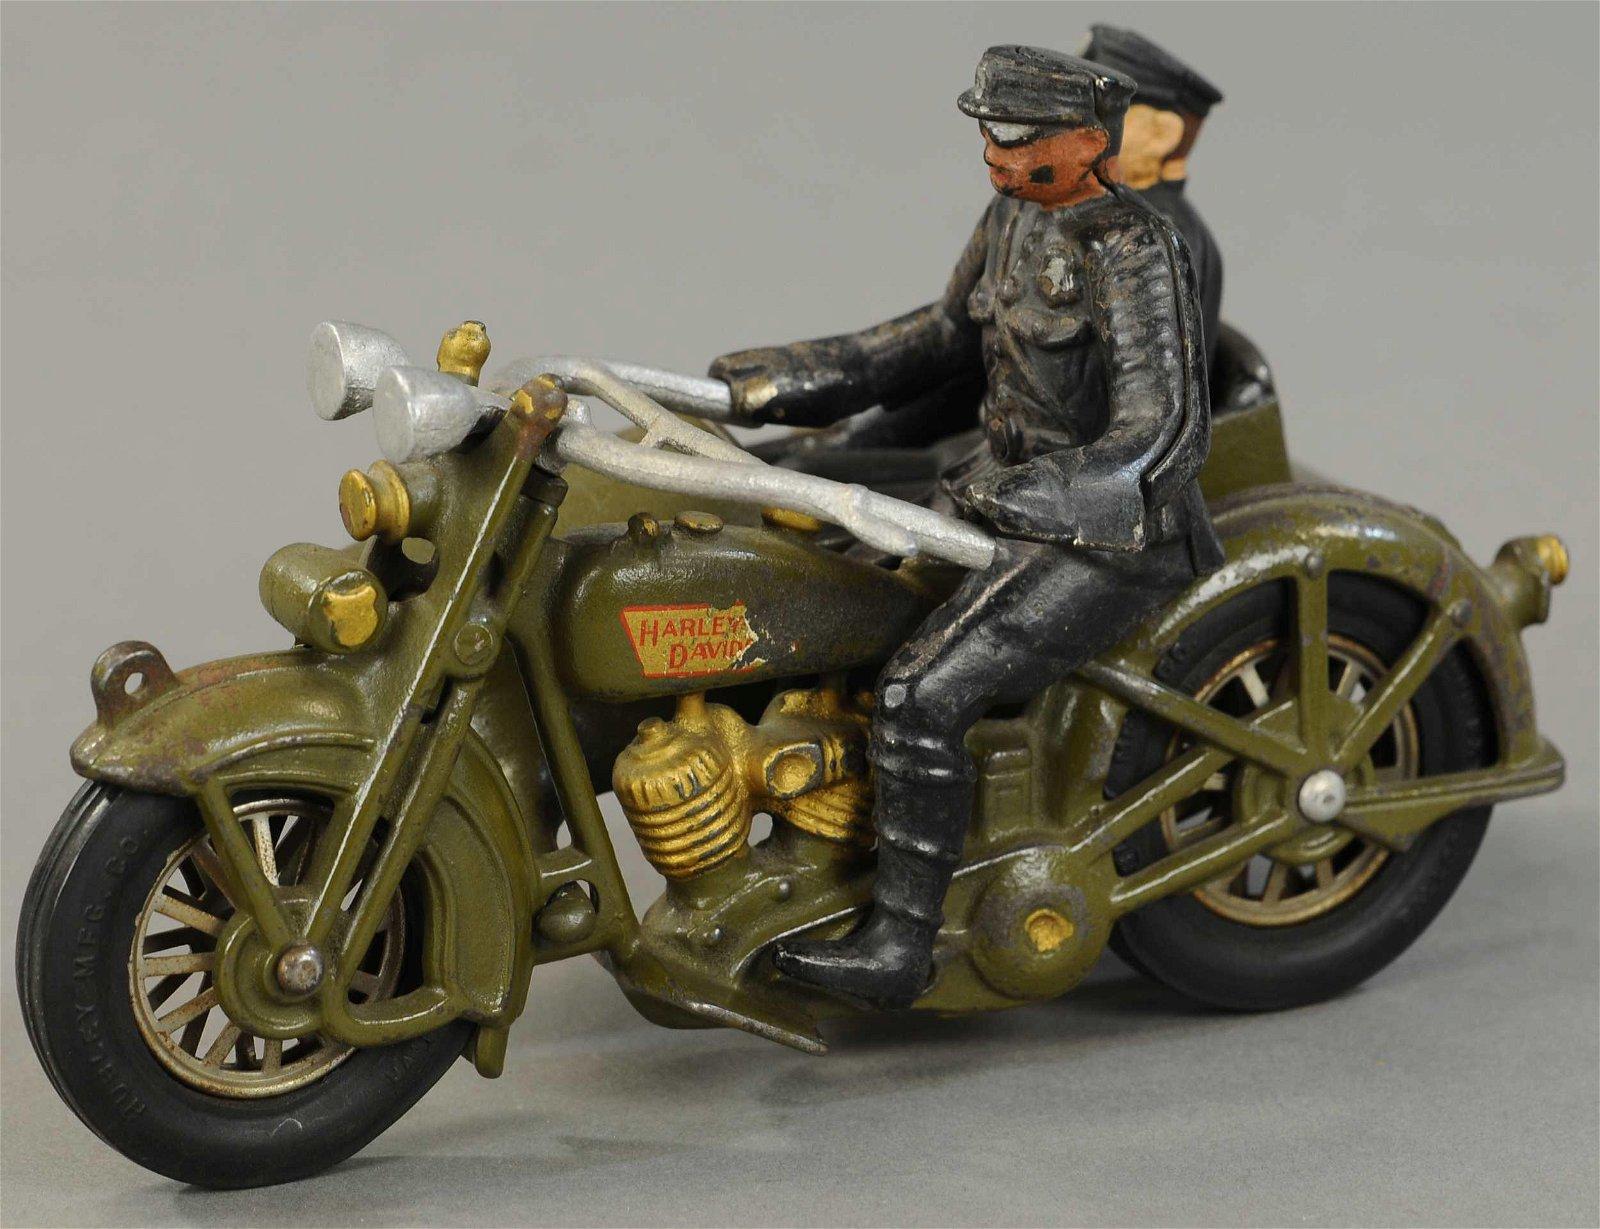 HUBLEY HARLEY DAVIDSON SIDECAR MOTORCYCLE